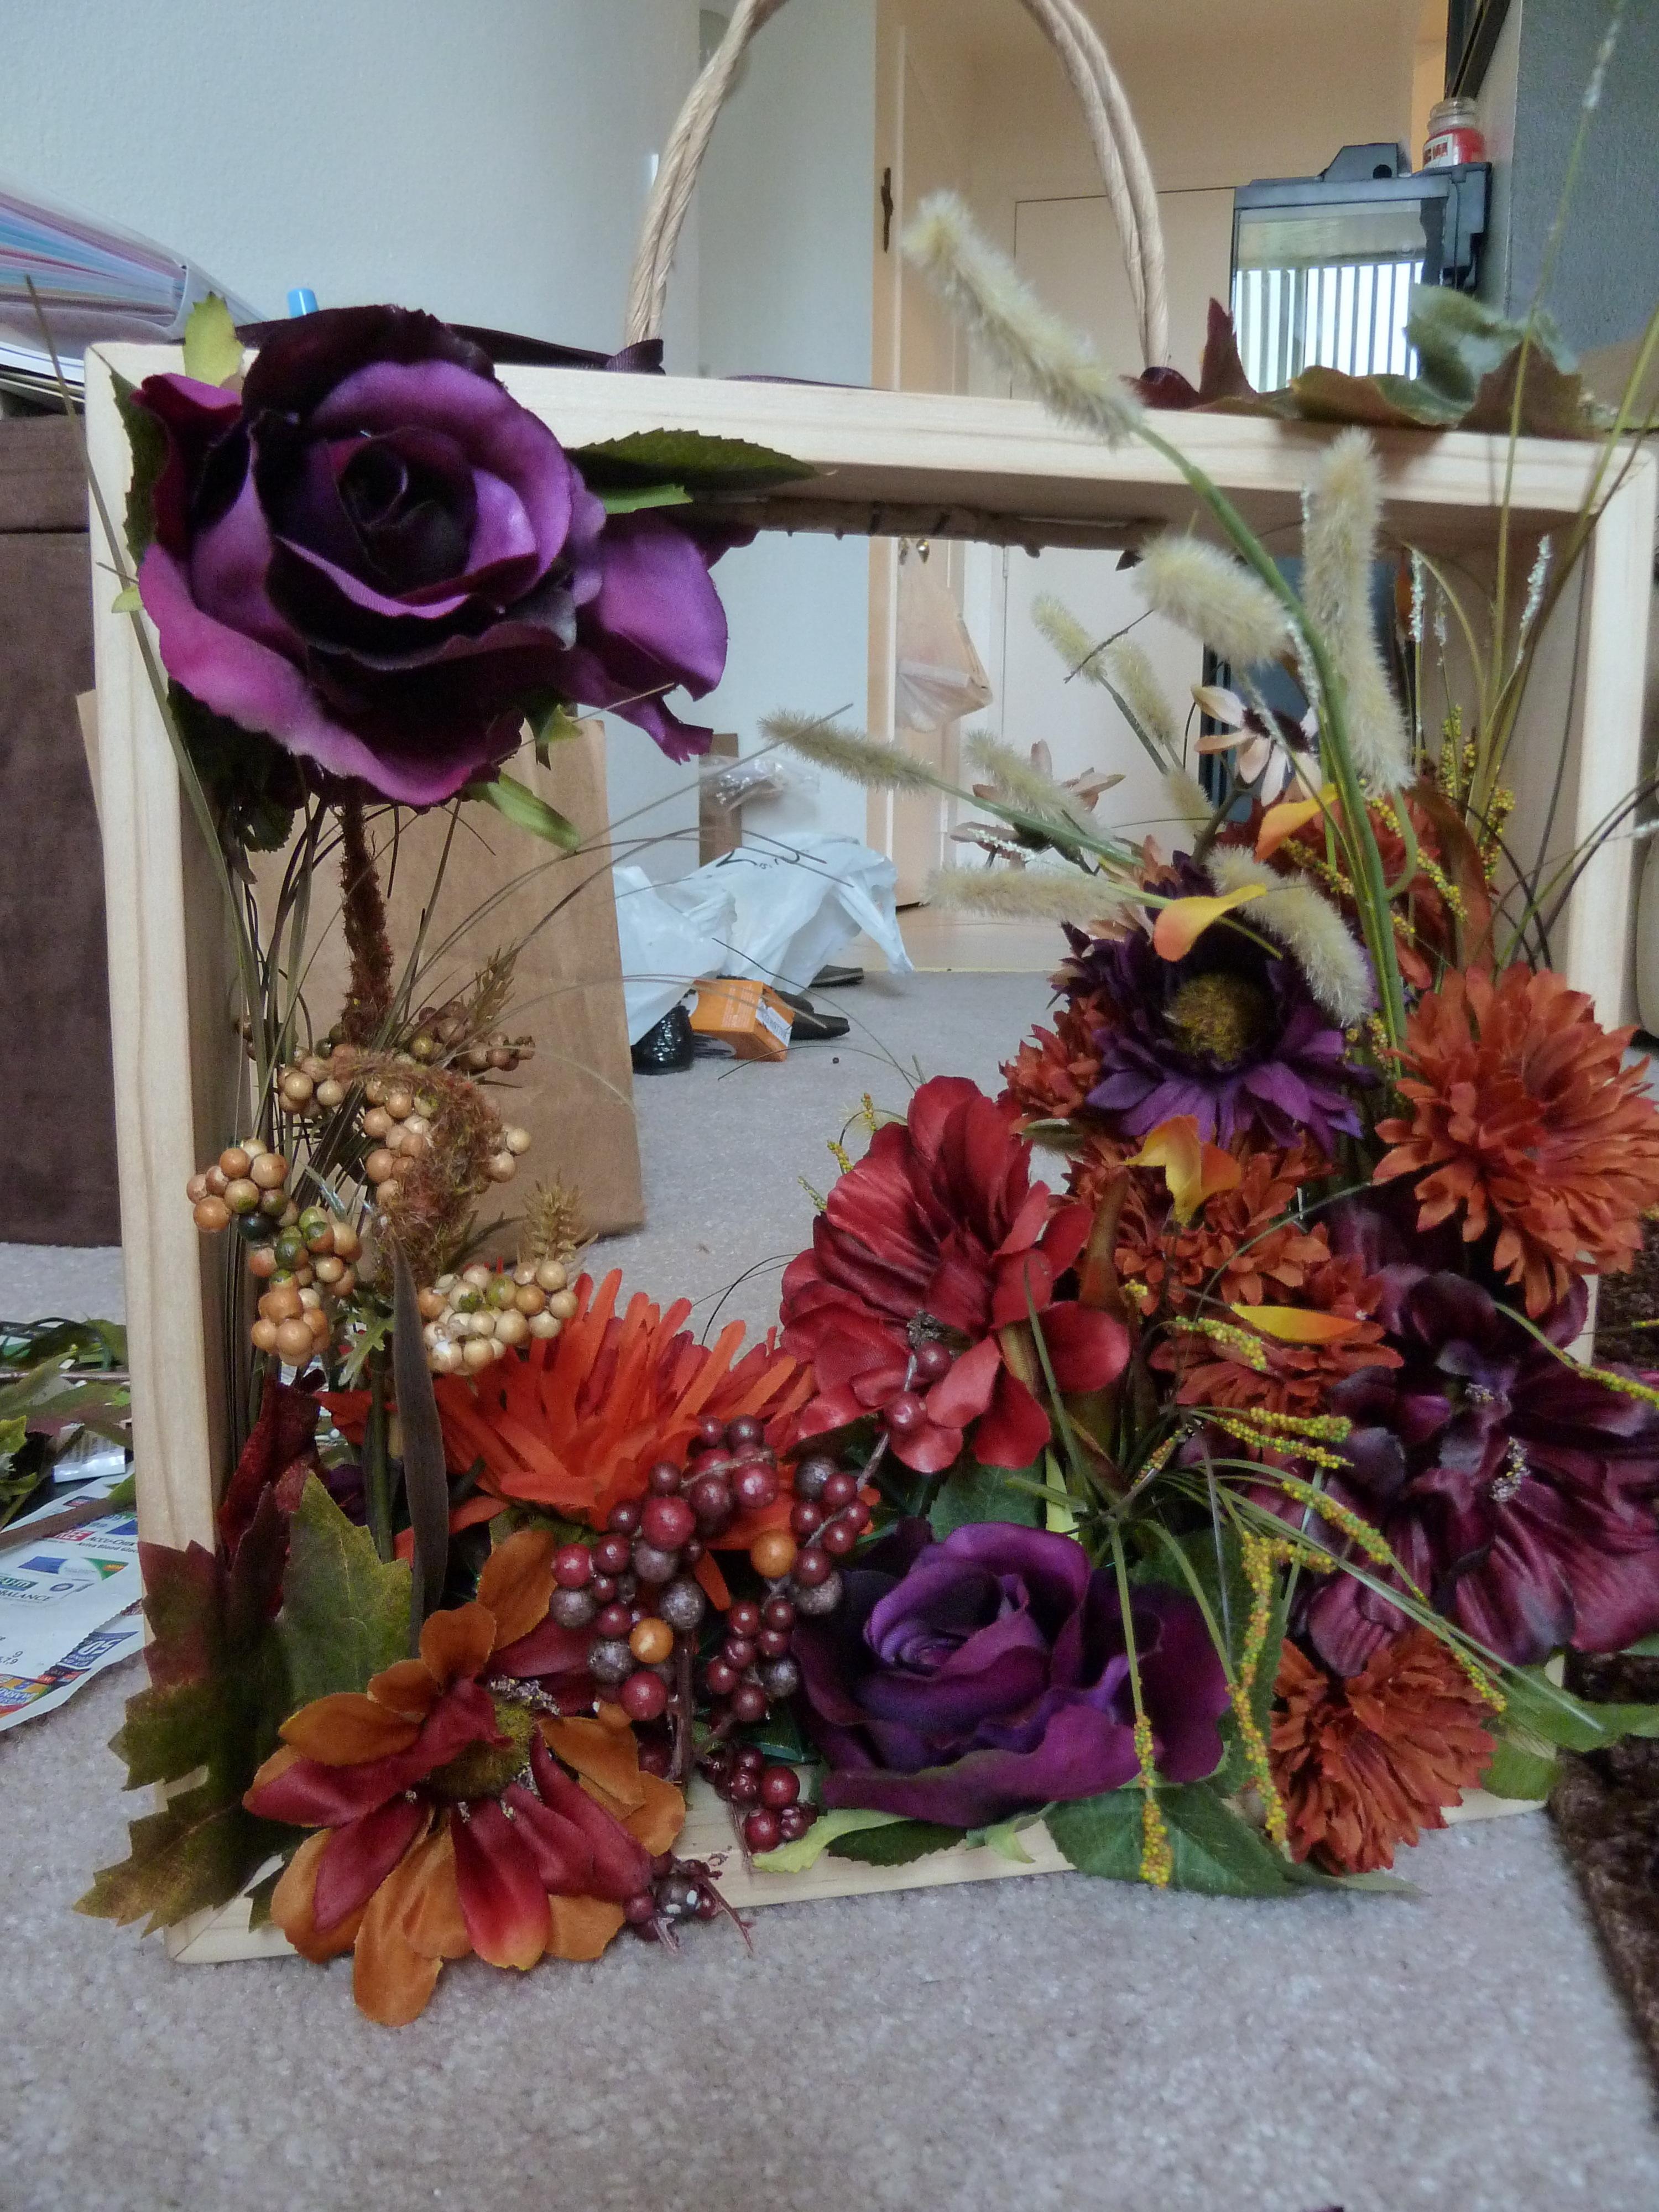 Flowers & Decor, Rustic, Flower, Girl, Box